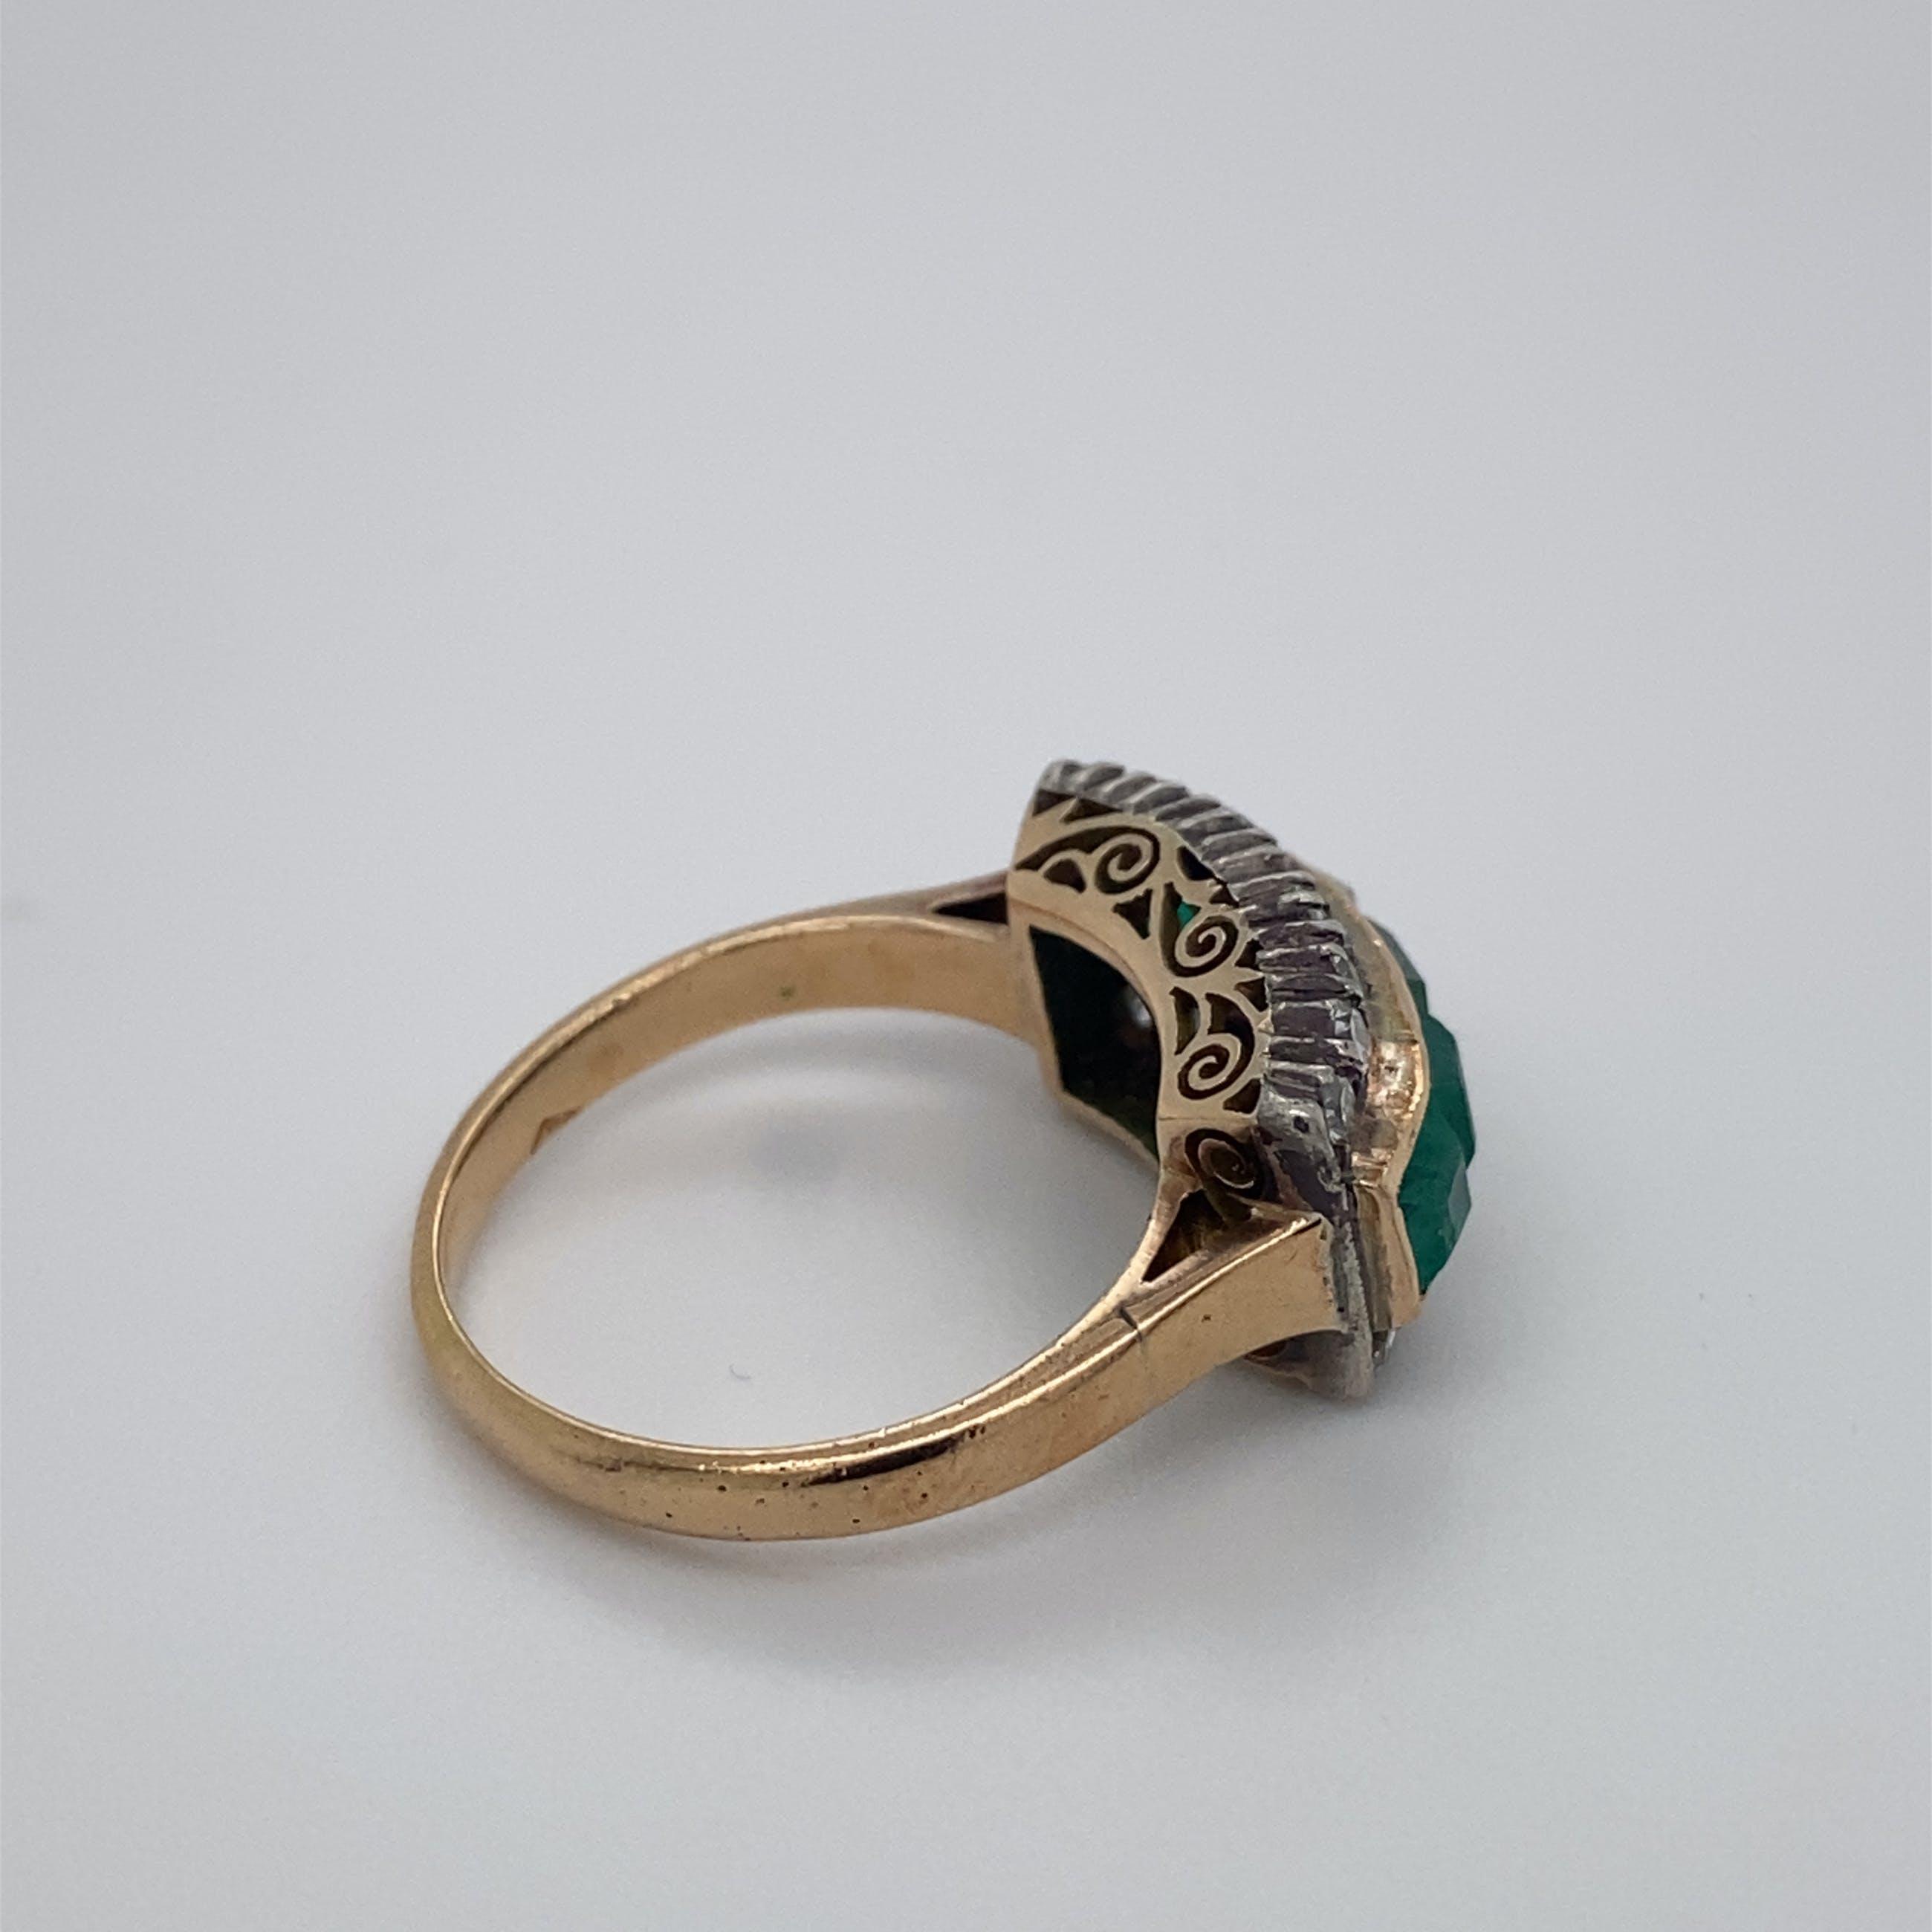 14kt bicolor vintage ring  met smaragd en diamant, mt 52,5/16.75. 3,89gr kopen? Bied vanaf 320!